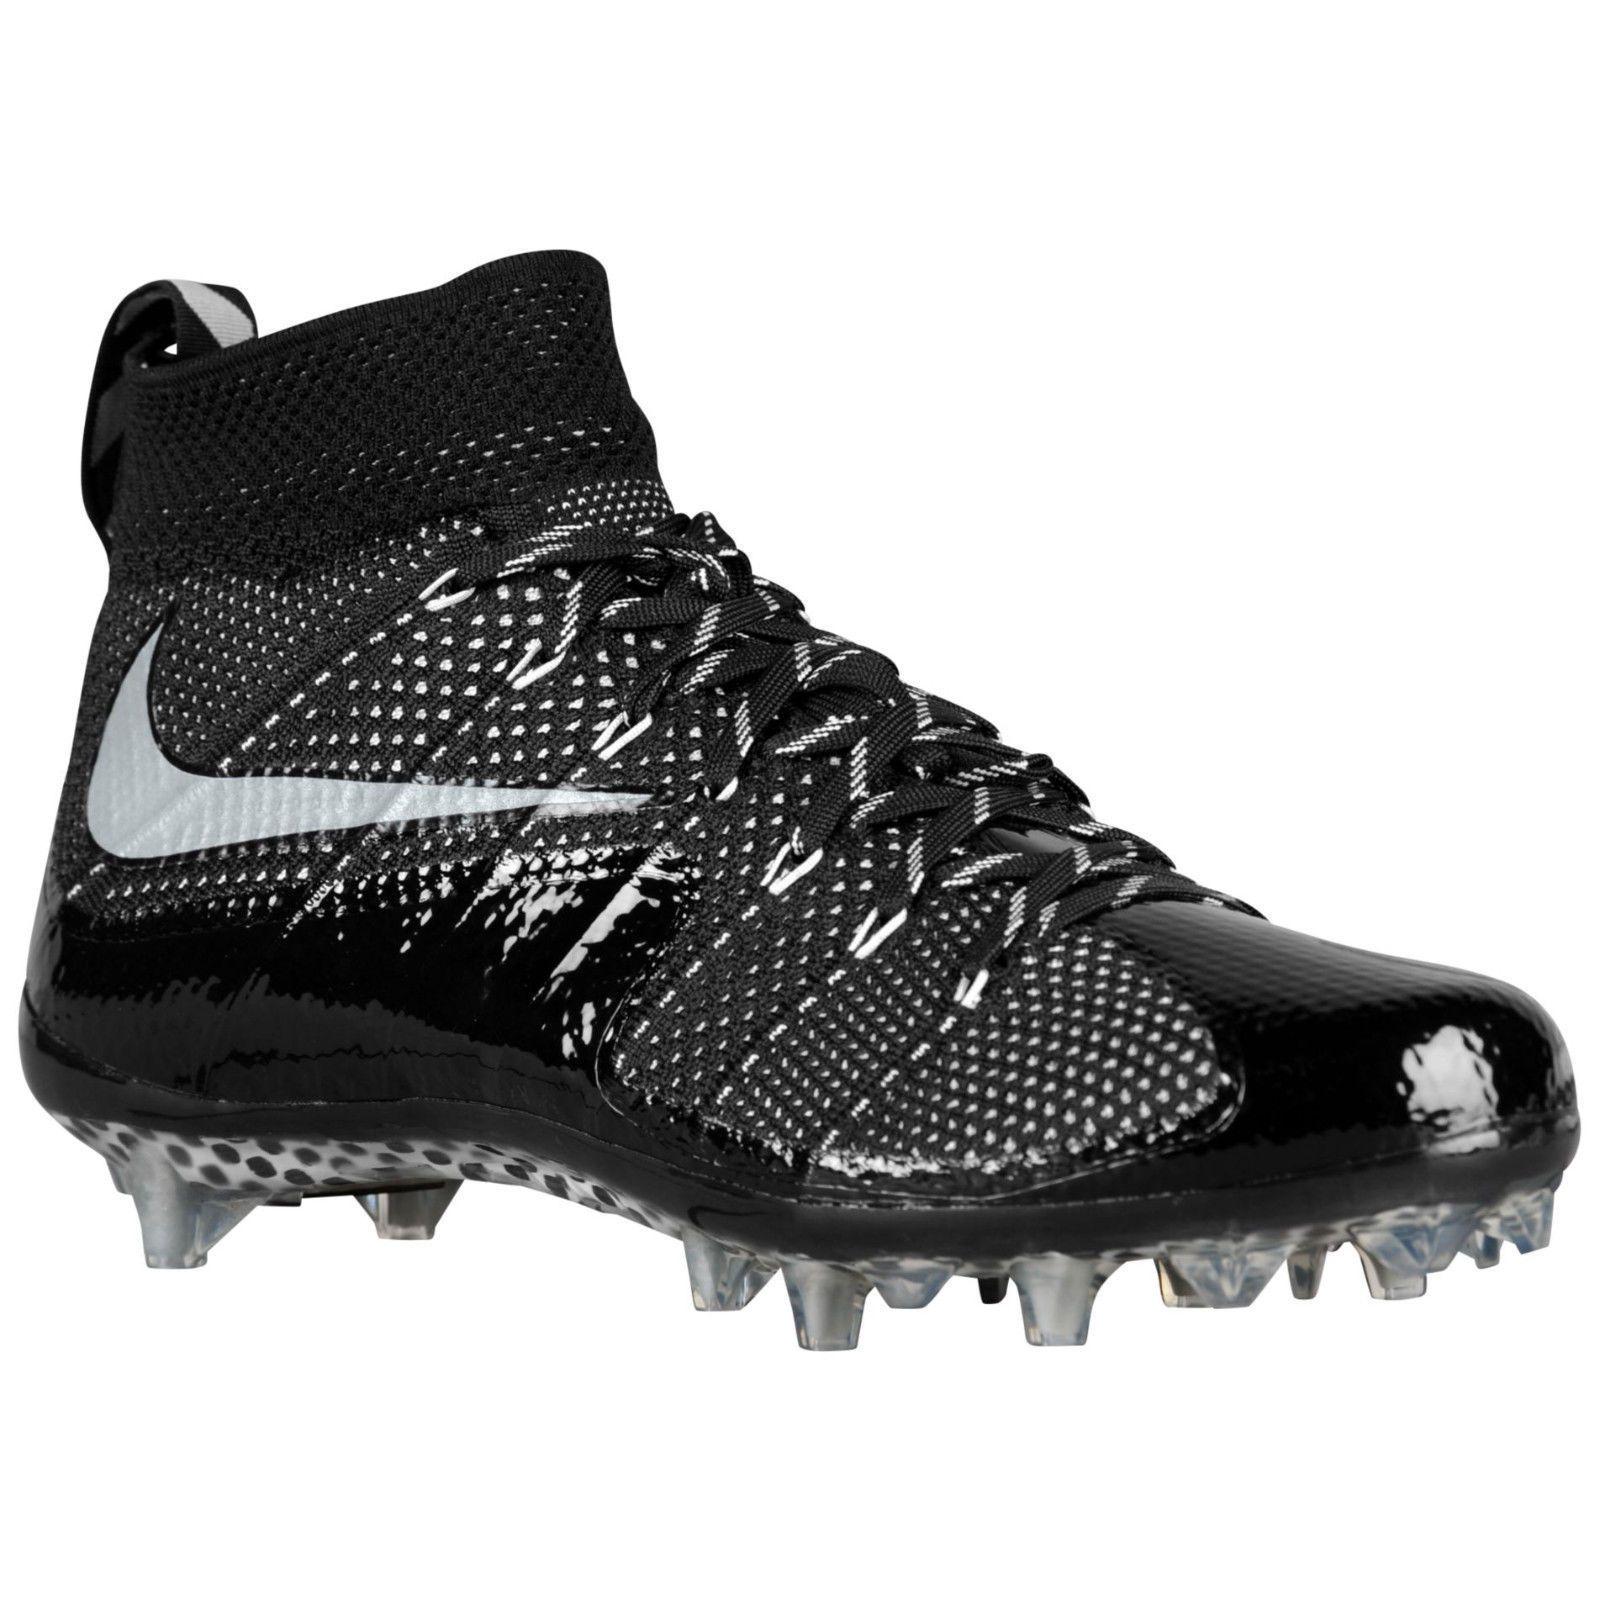 Nike vapor untouchable td football cleats blackwhite size